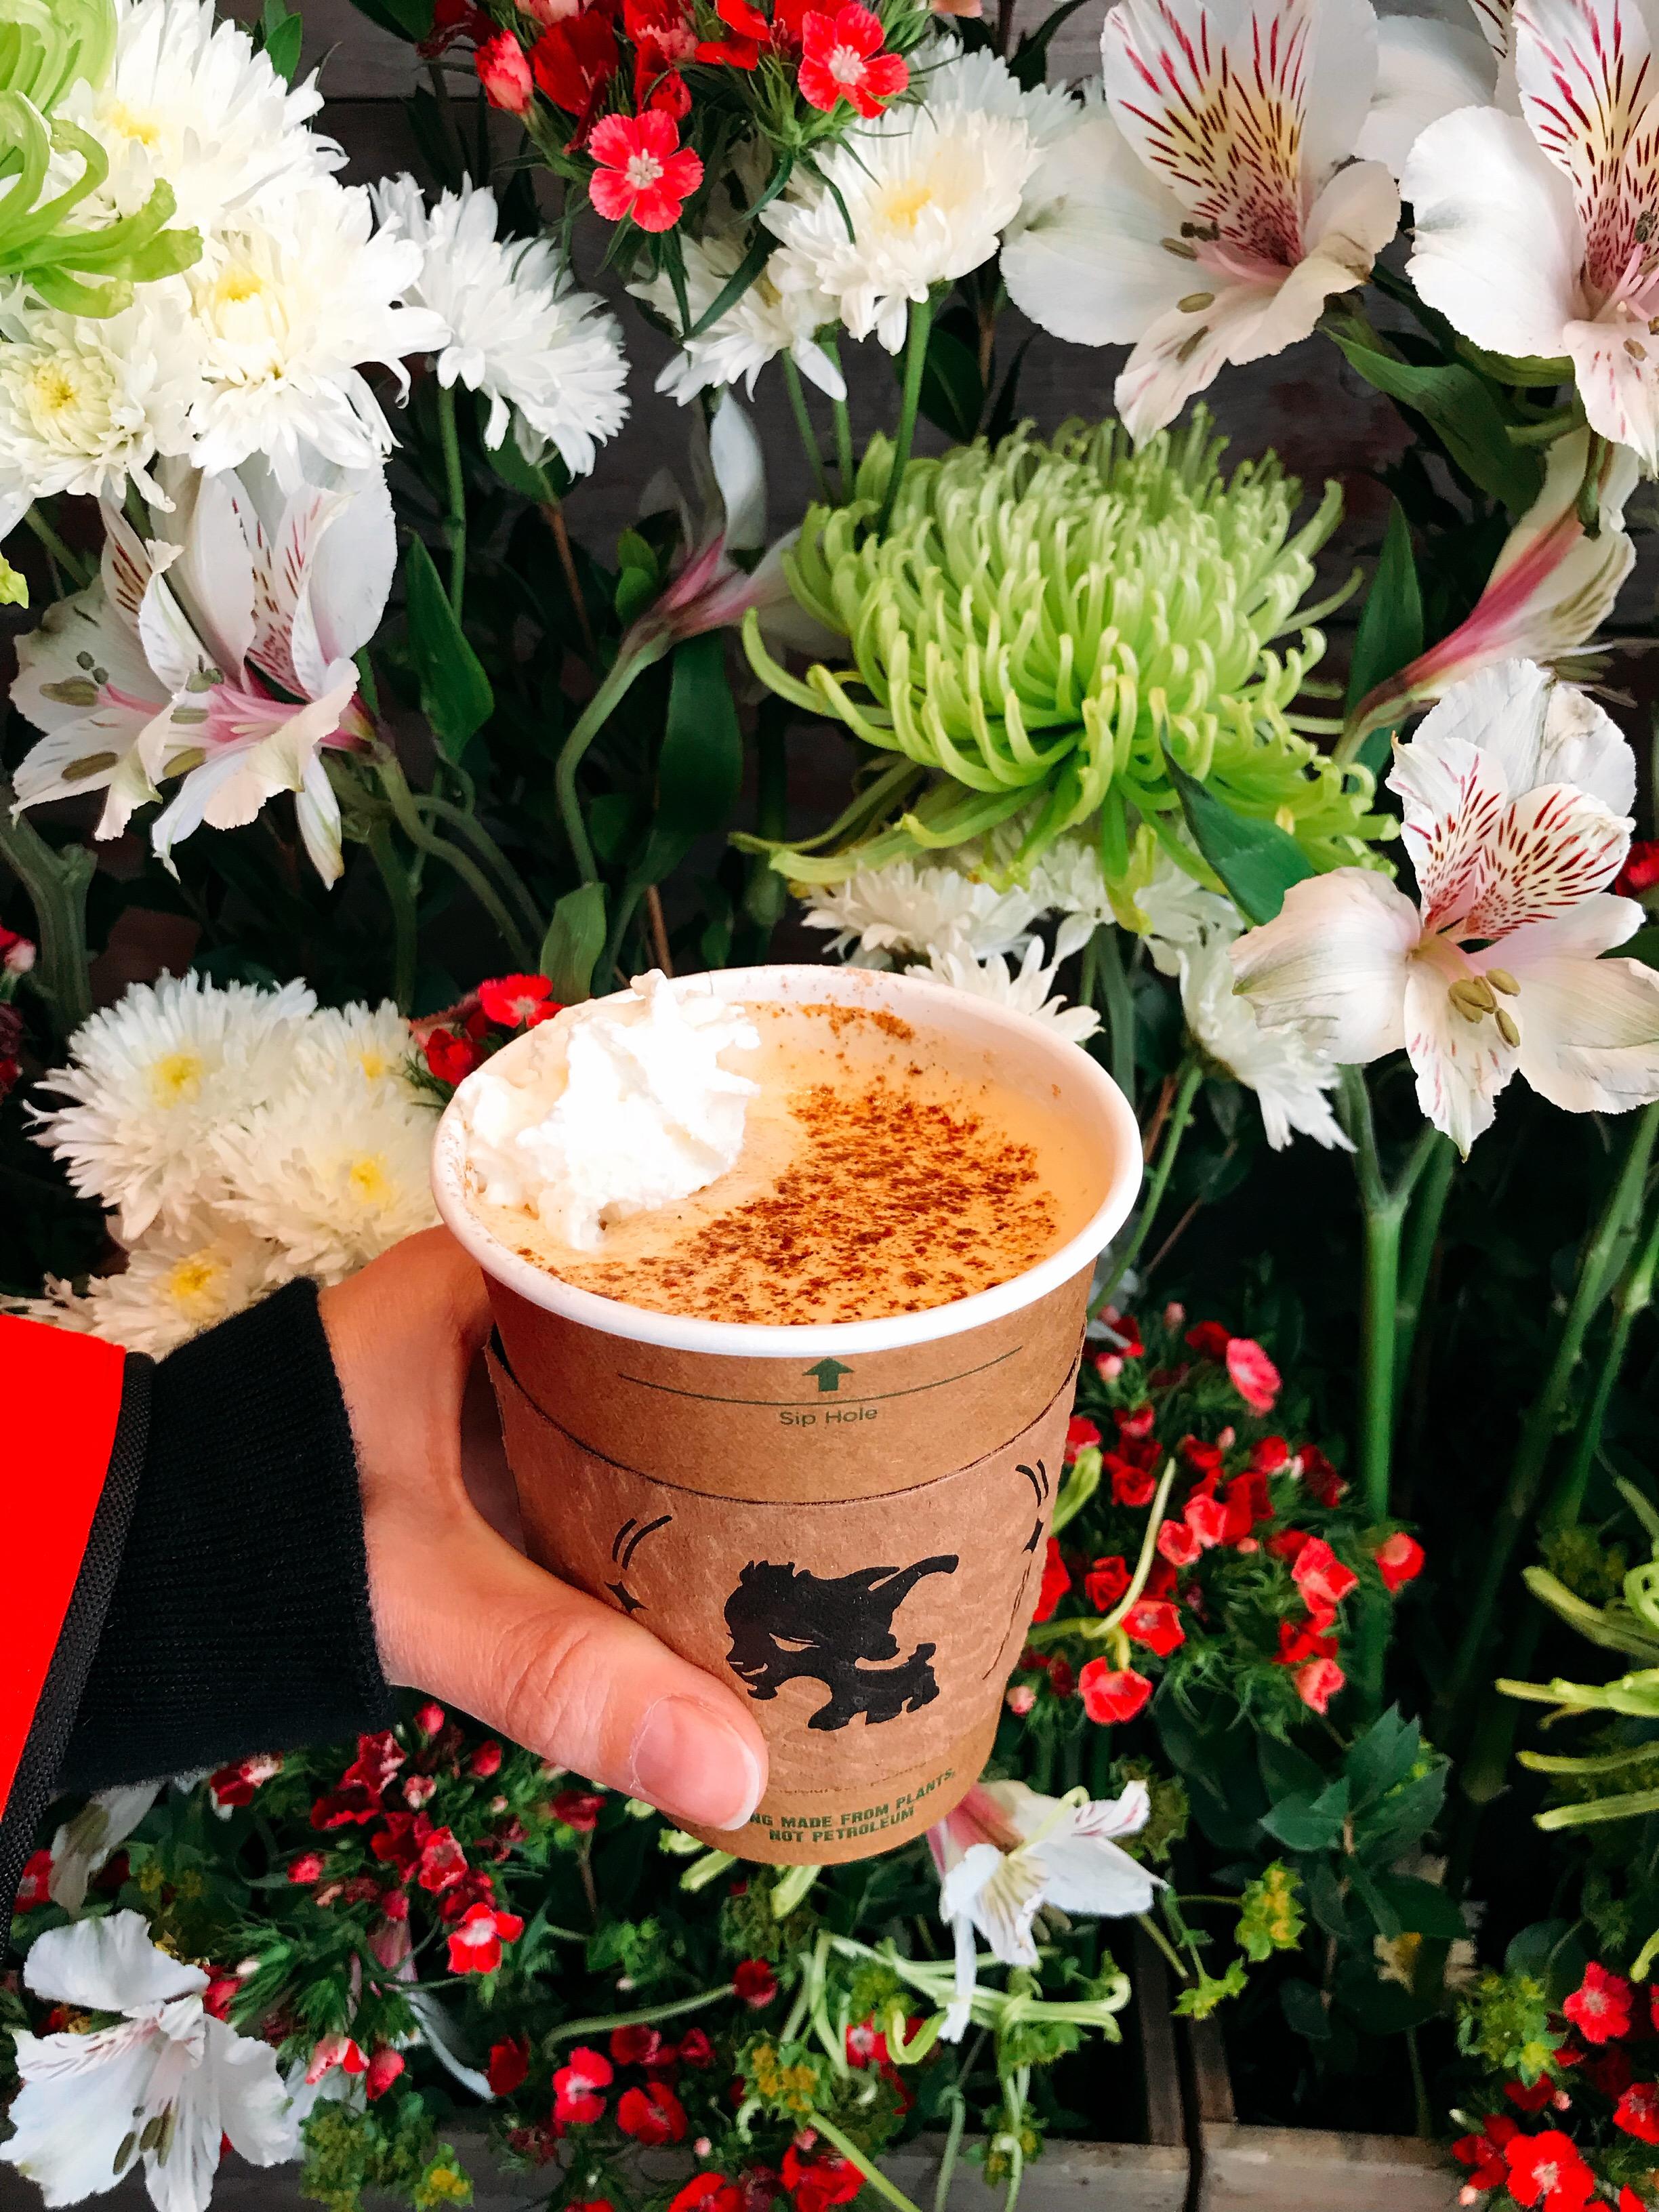 Little Goat Latte: Espresso, Goat Milk, Caramel and Masala Spices